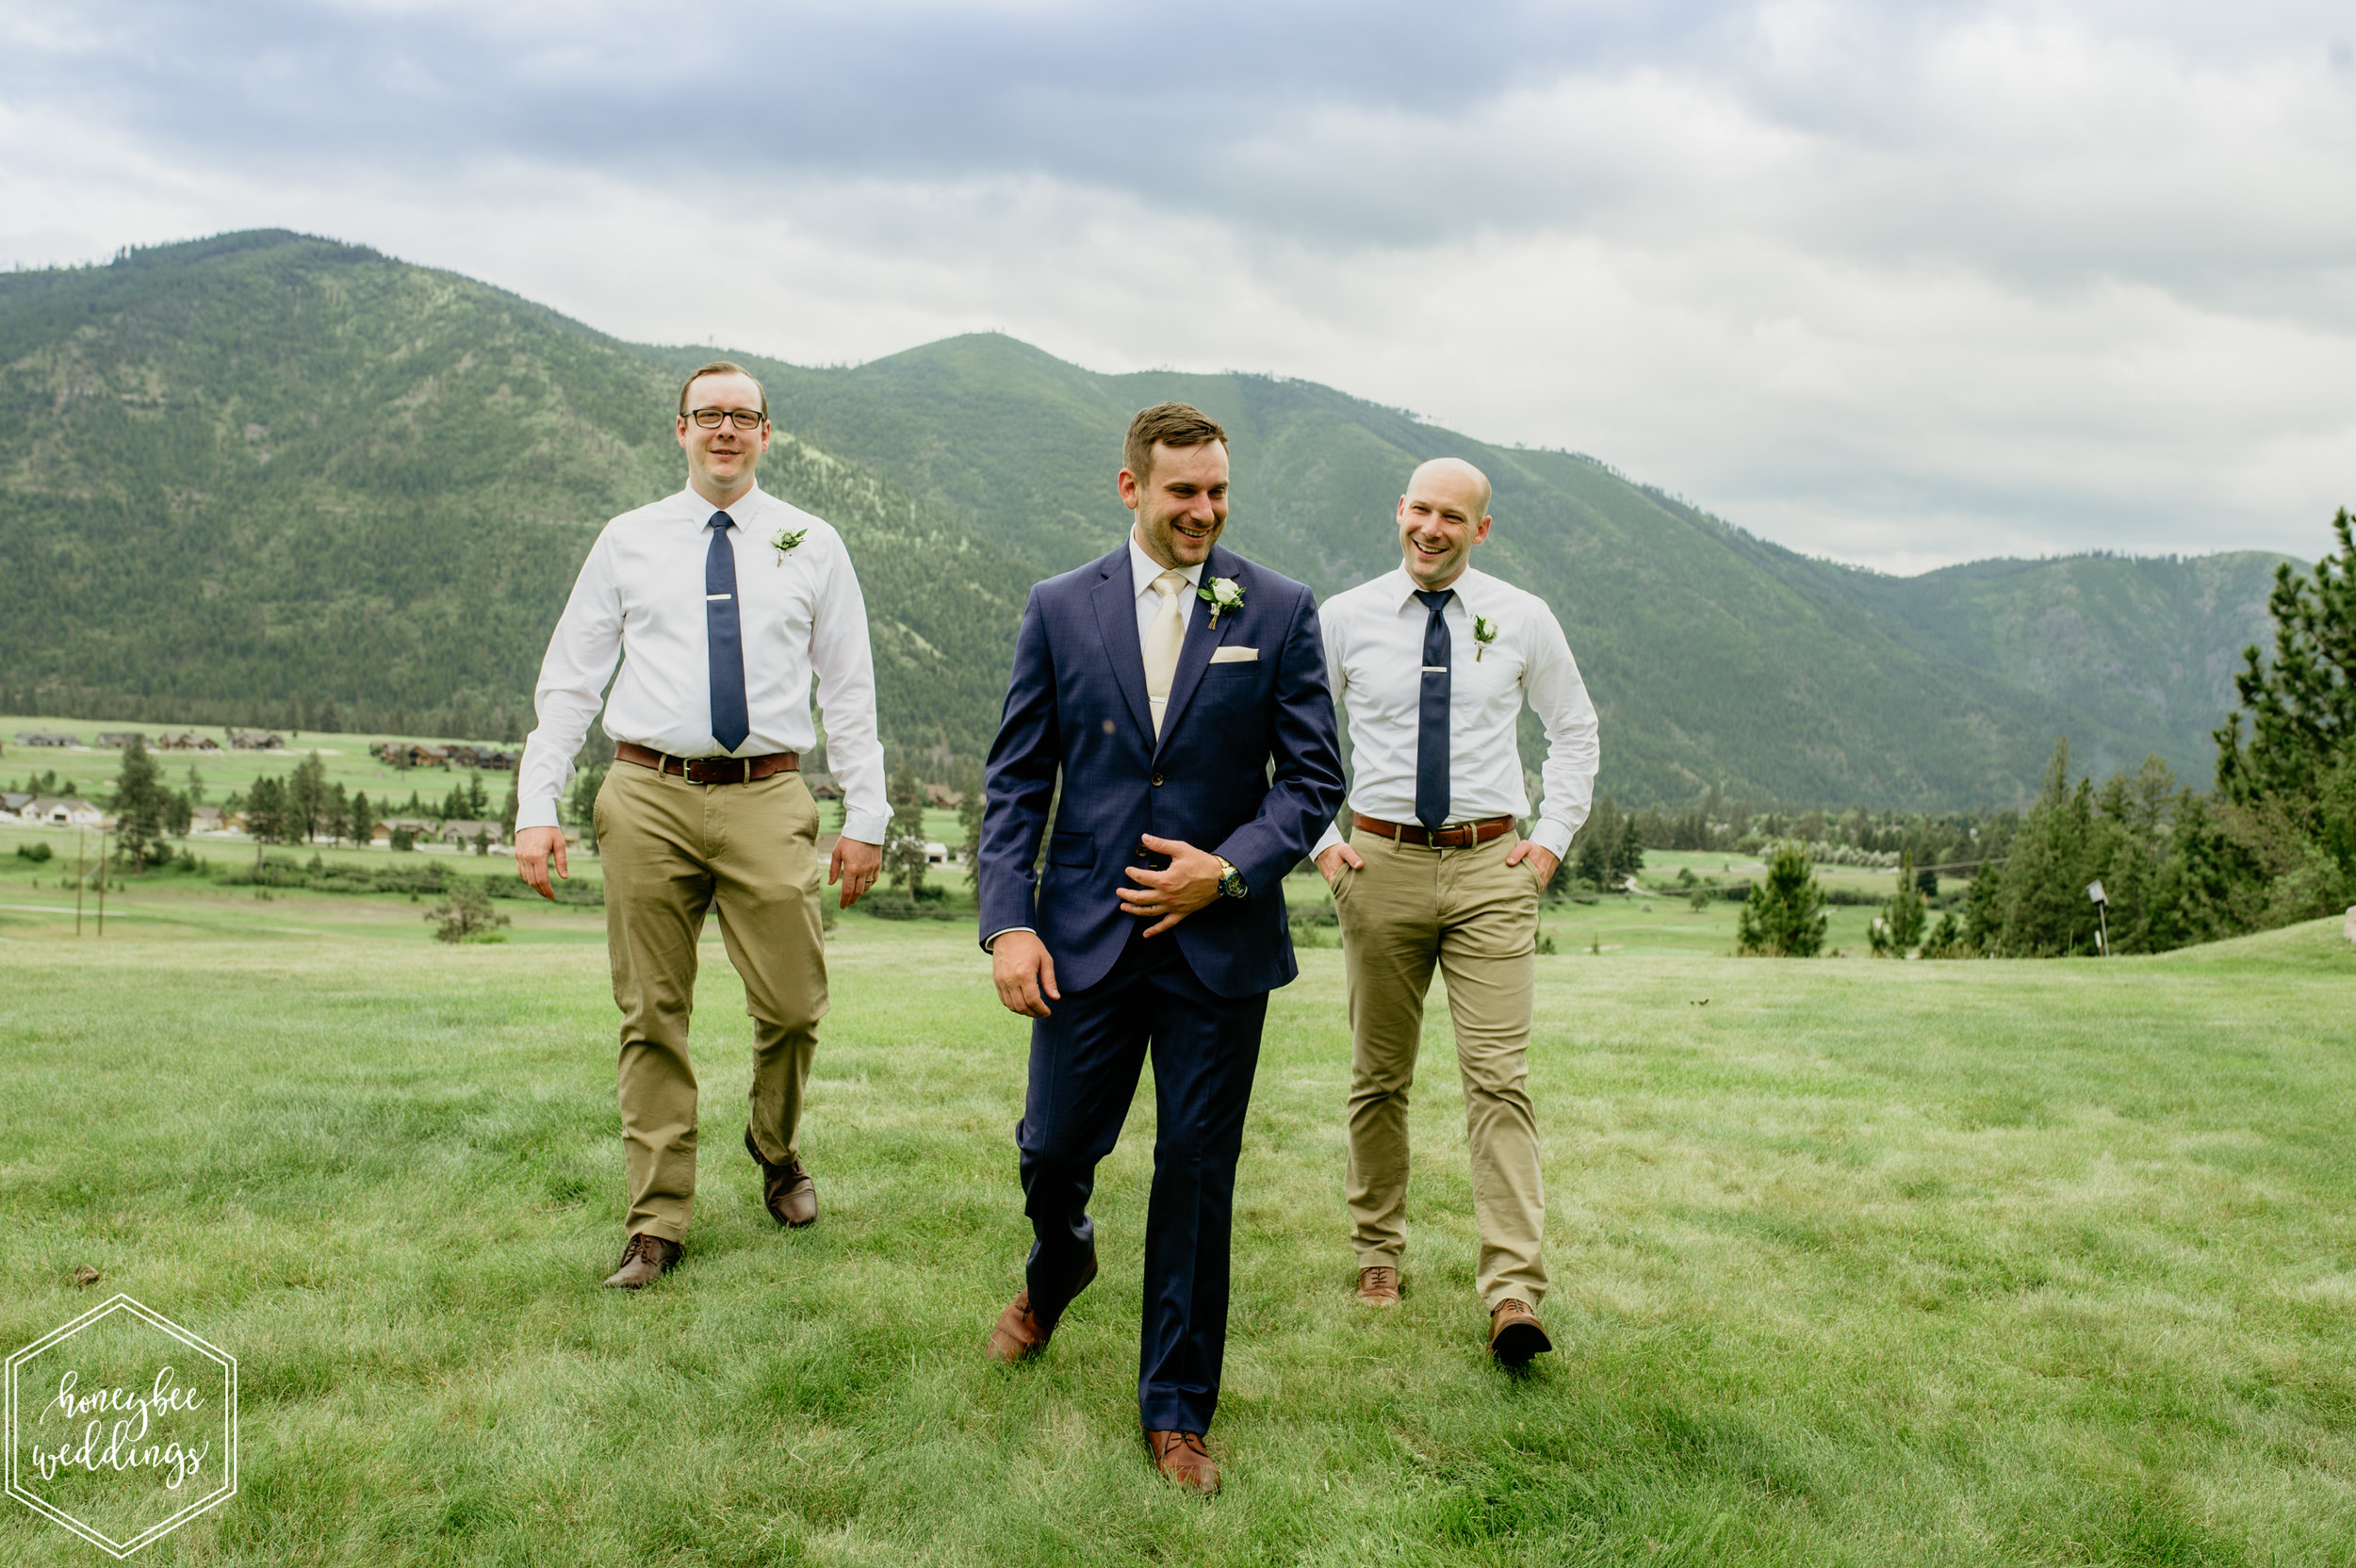 246Montana Wedding Photographer_Missoula Wedding_Honeybee Weddings_Devlin & Jacob_June 22, 2019-2997.jpg